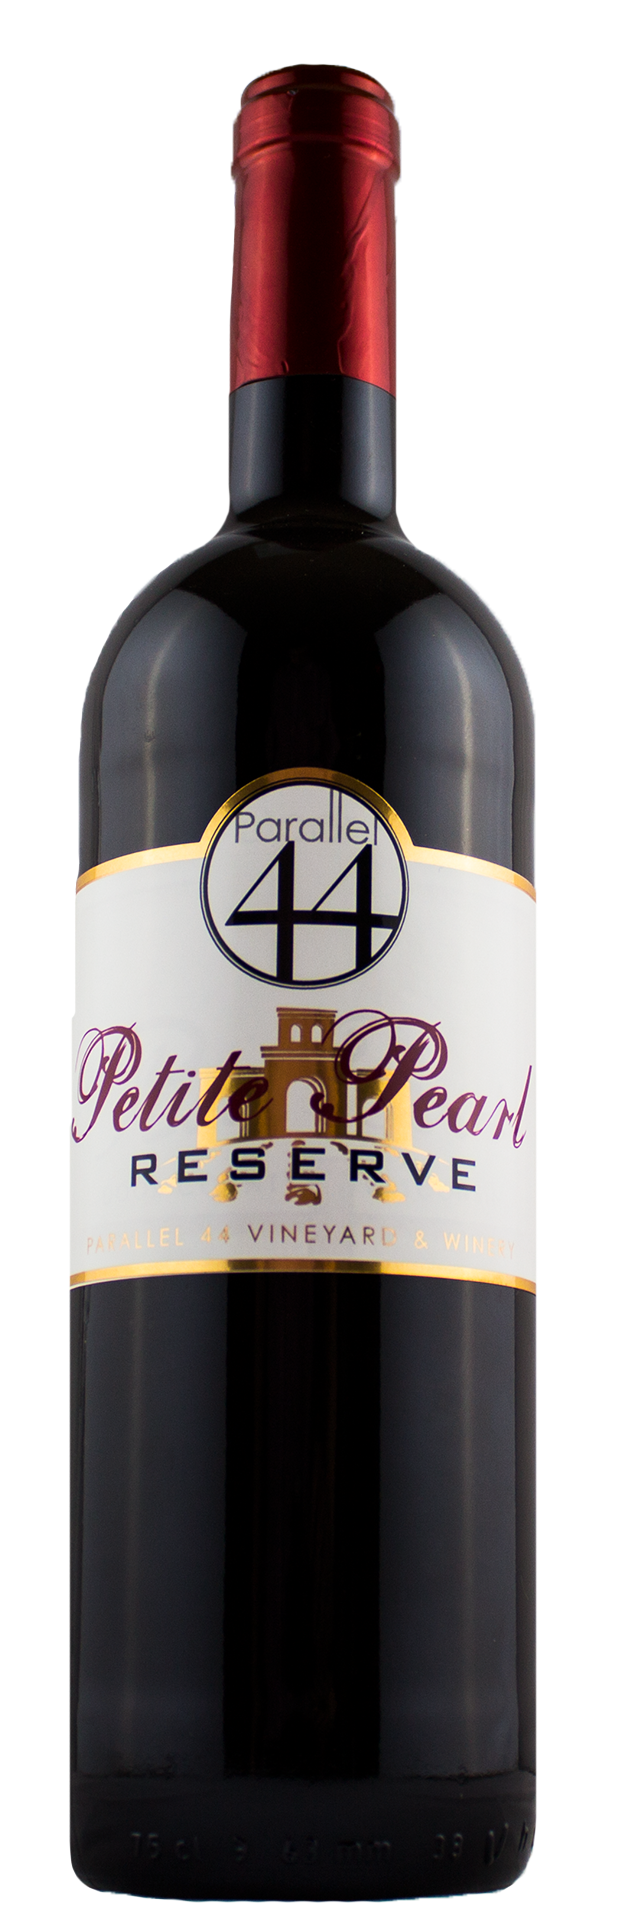 Petite Pearl Reserve Parallel44